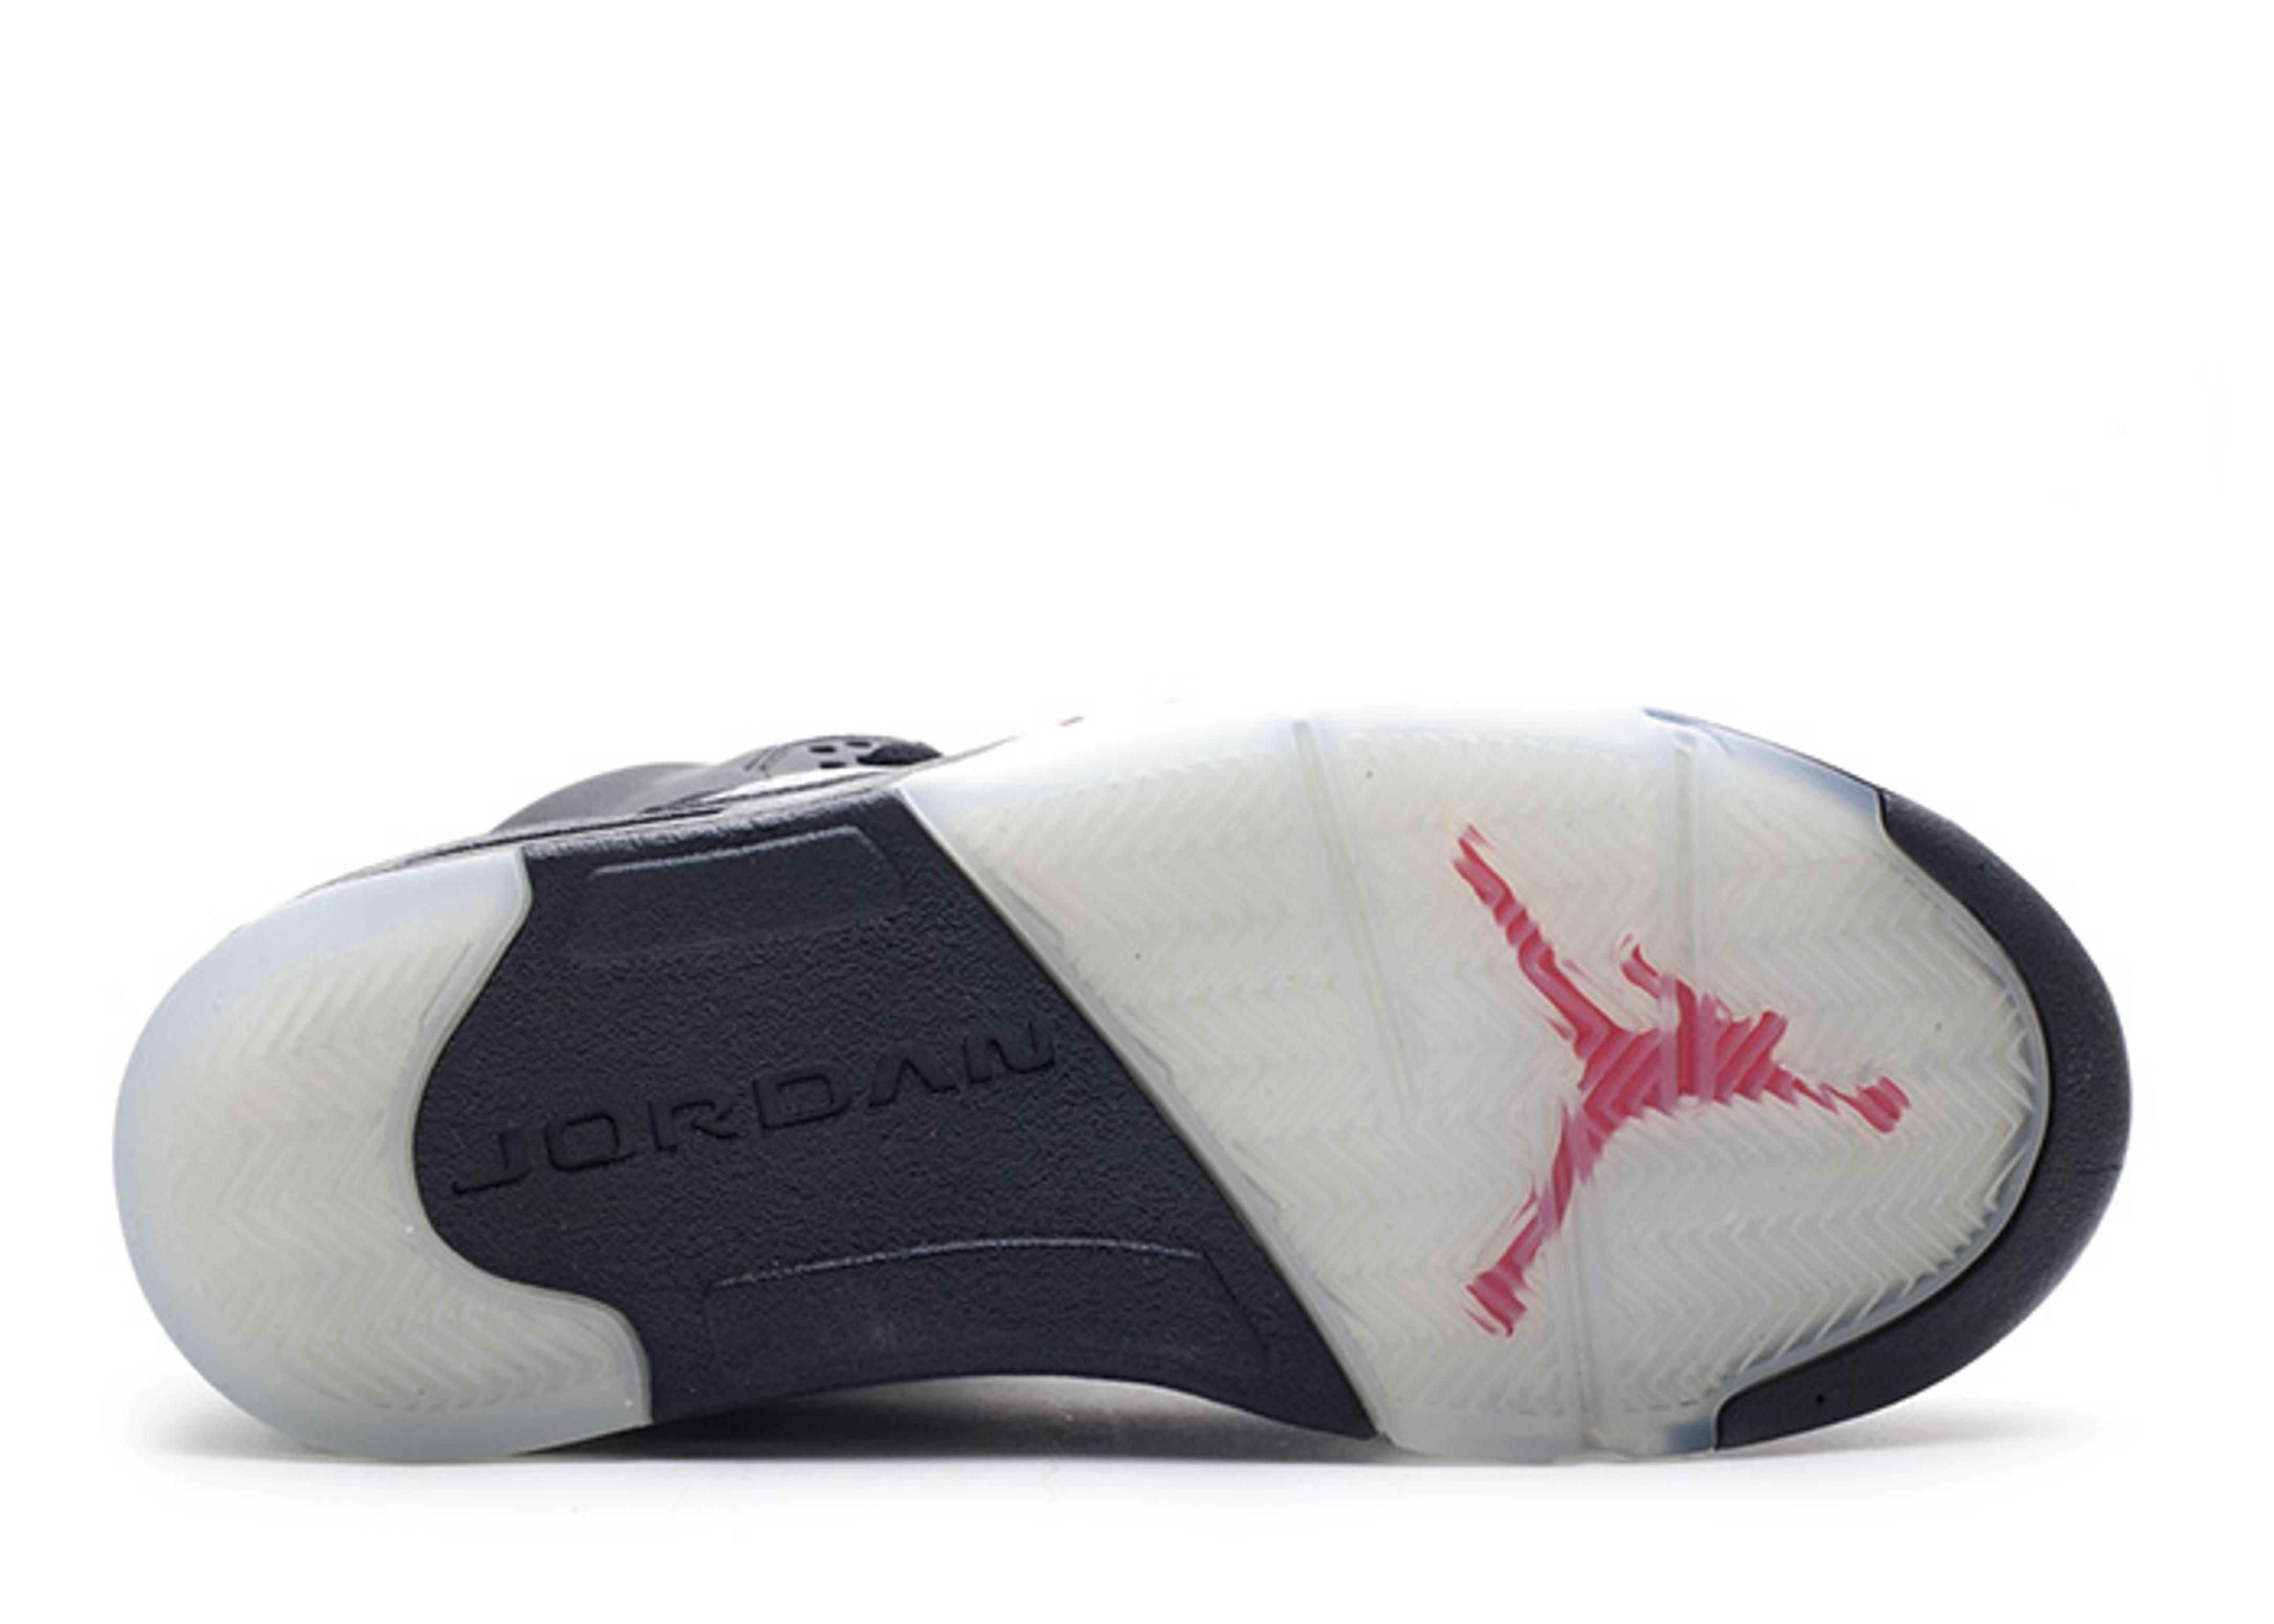 5aee1da55e22 Air Jordan 5 Retro Dmp